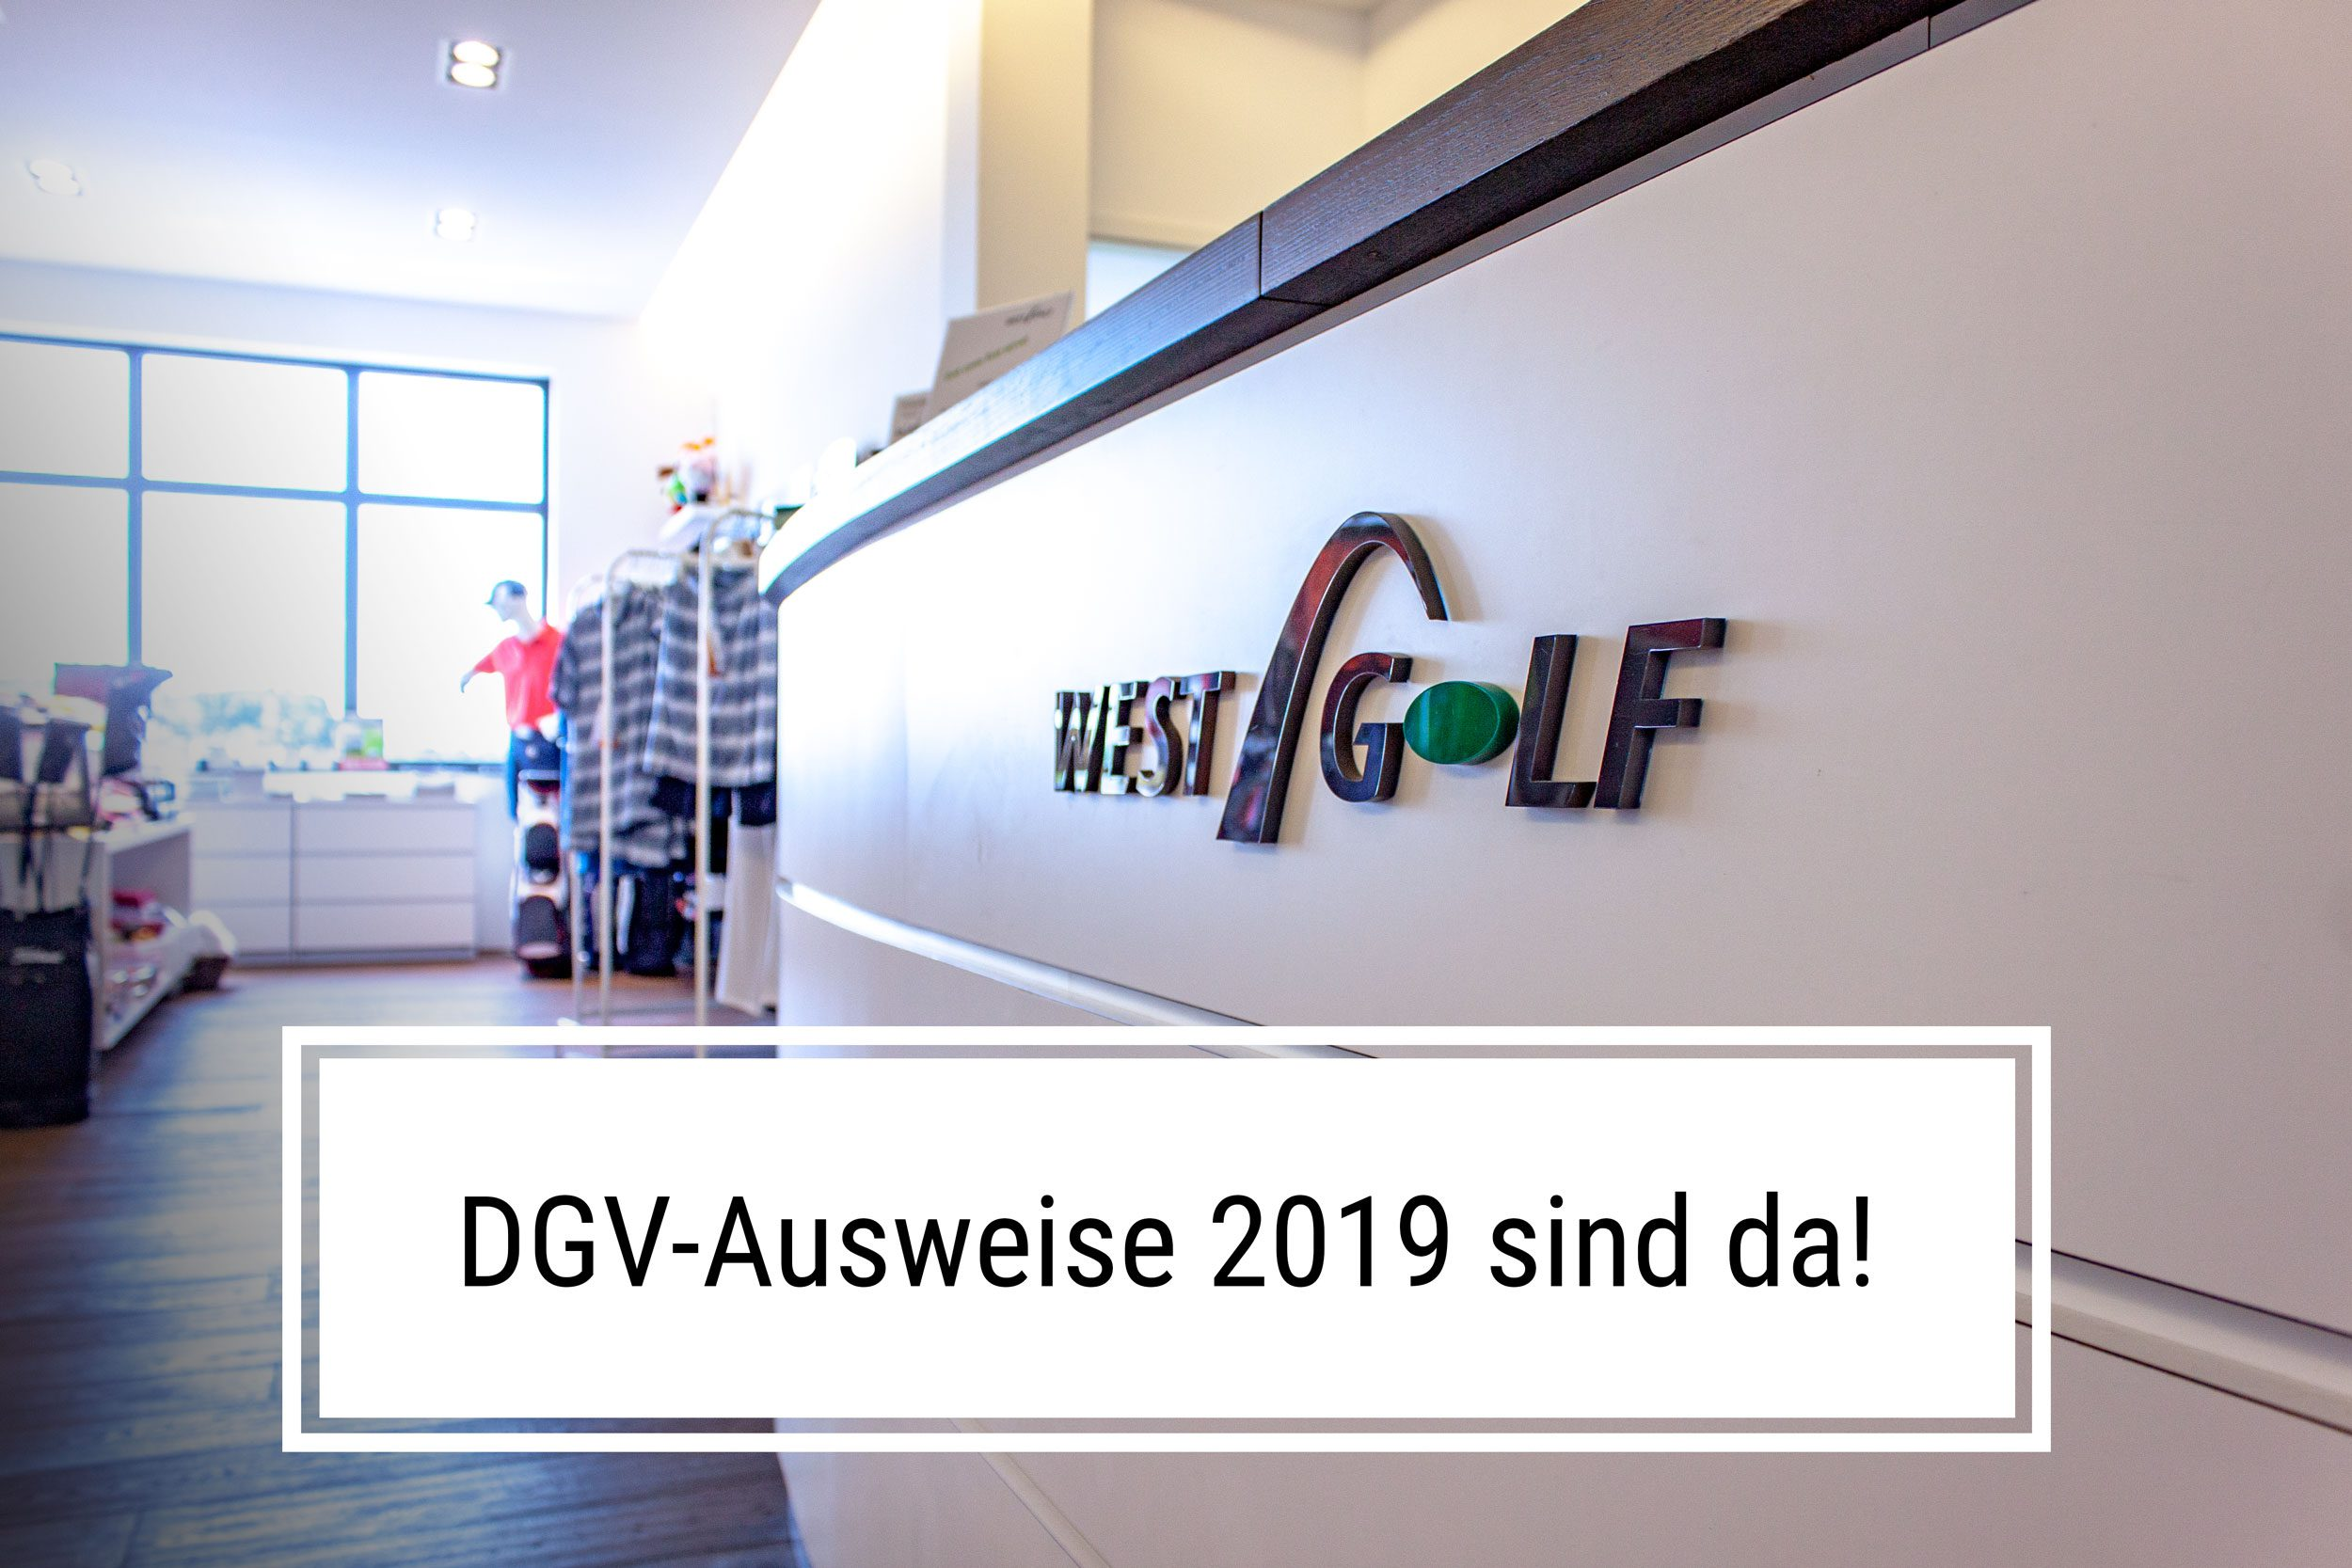 DGV-Ausweise 2019 sind da!